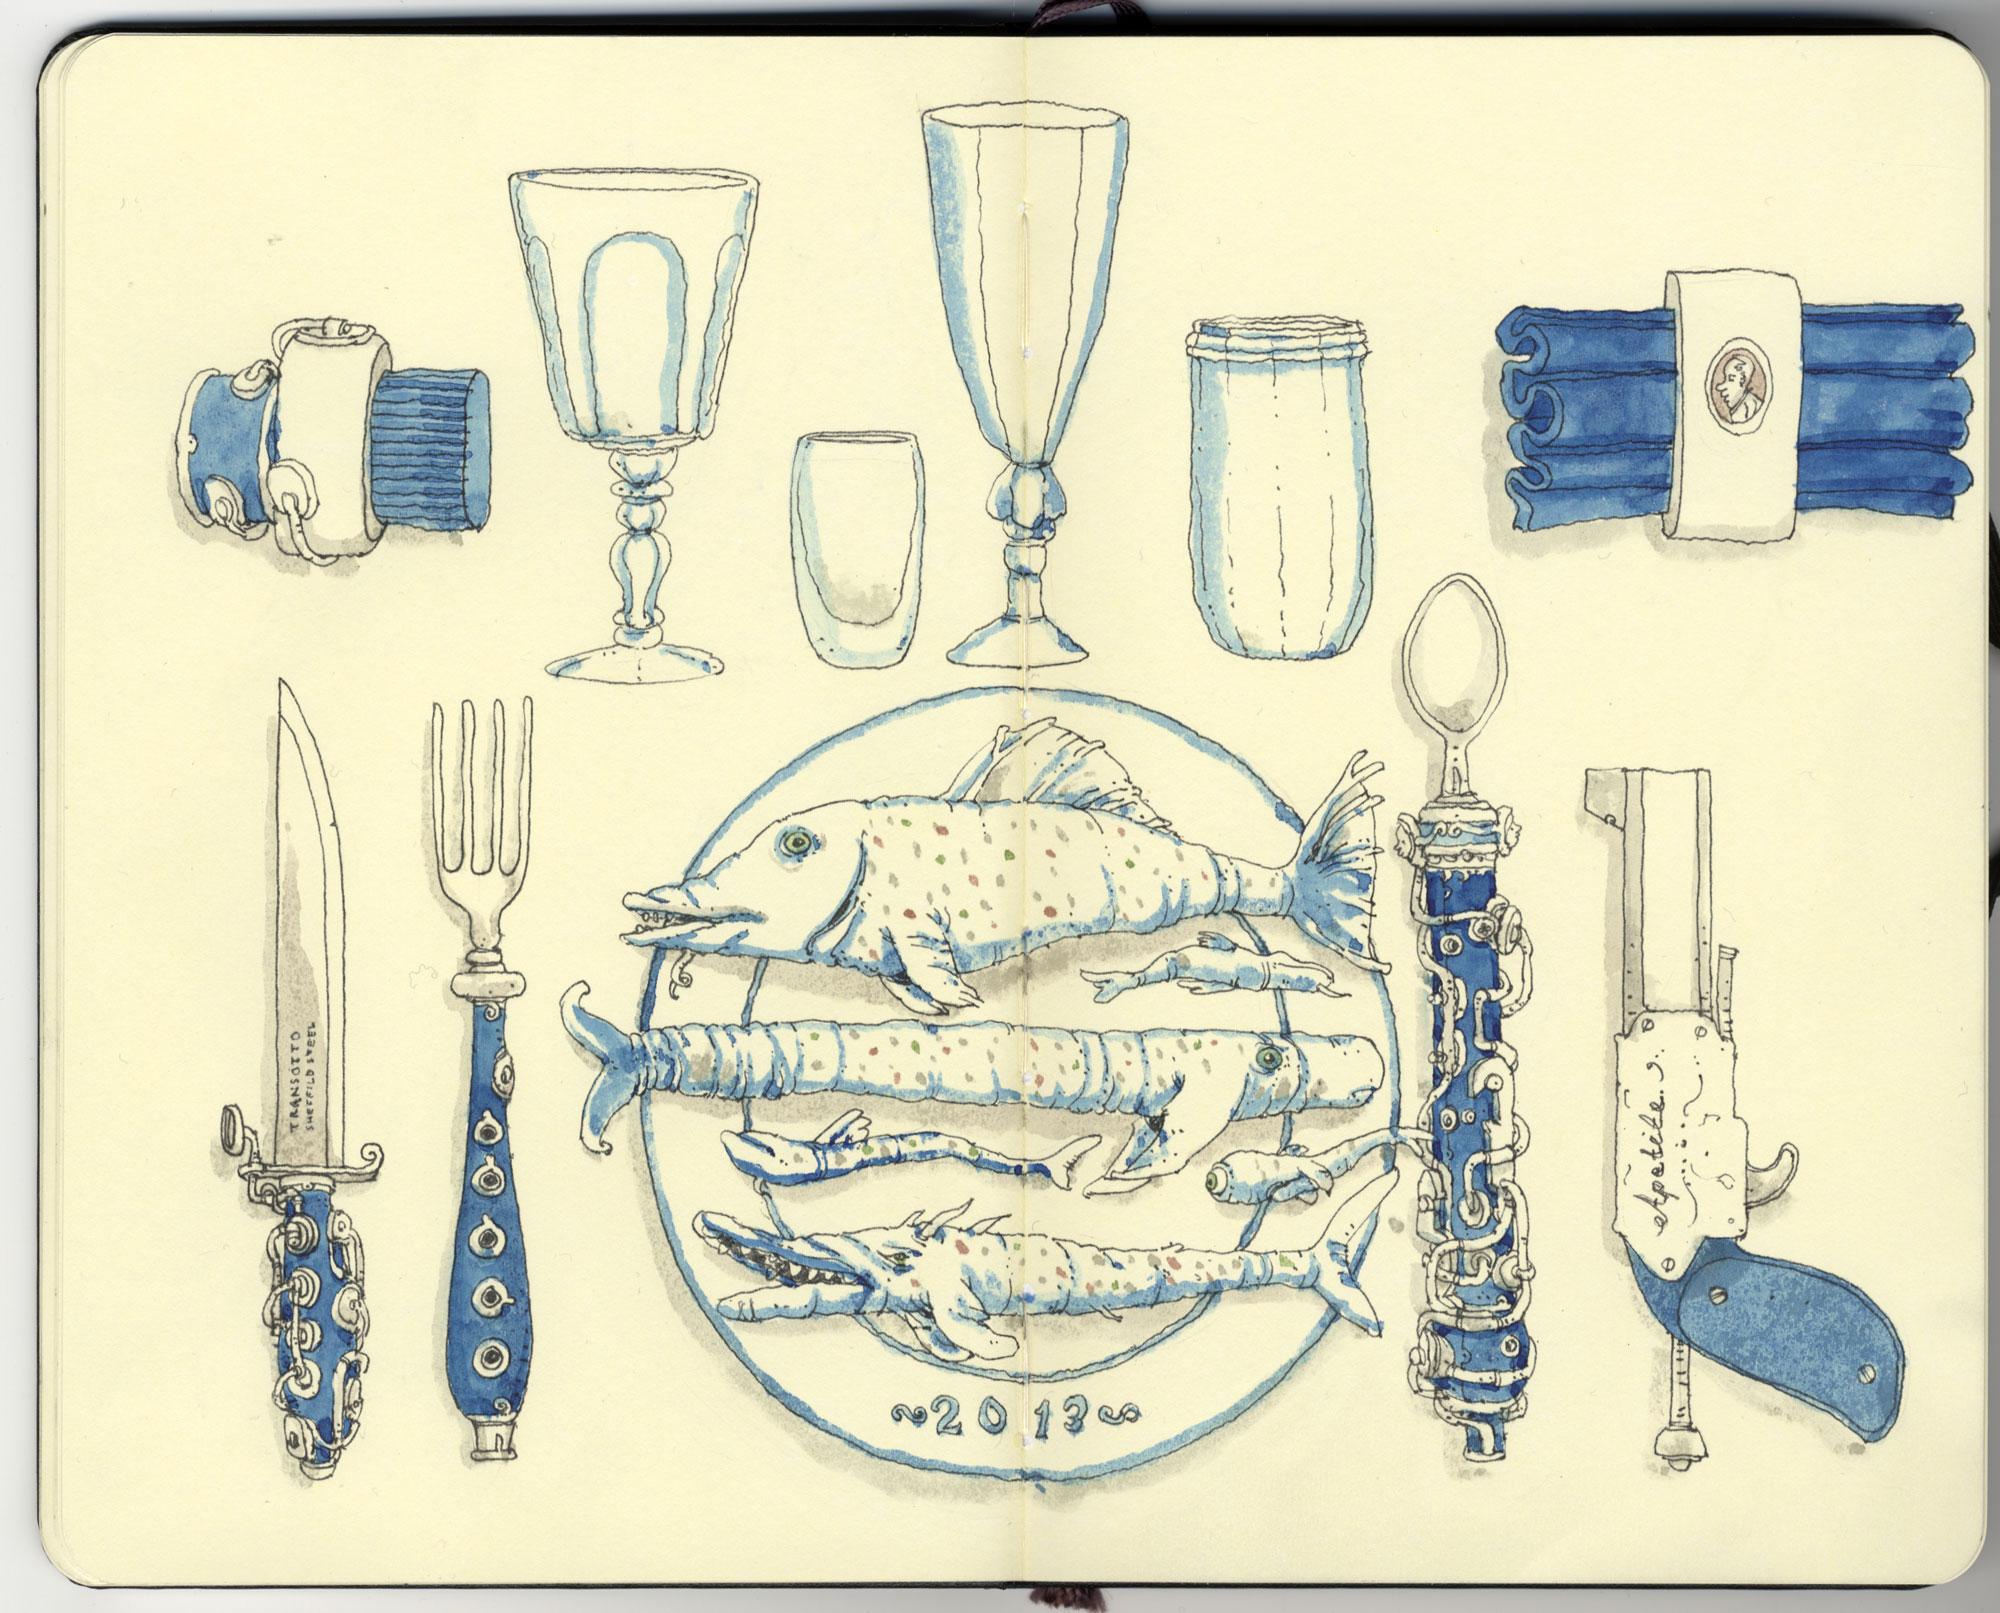 Banquette by MattiasA